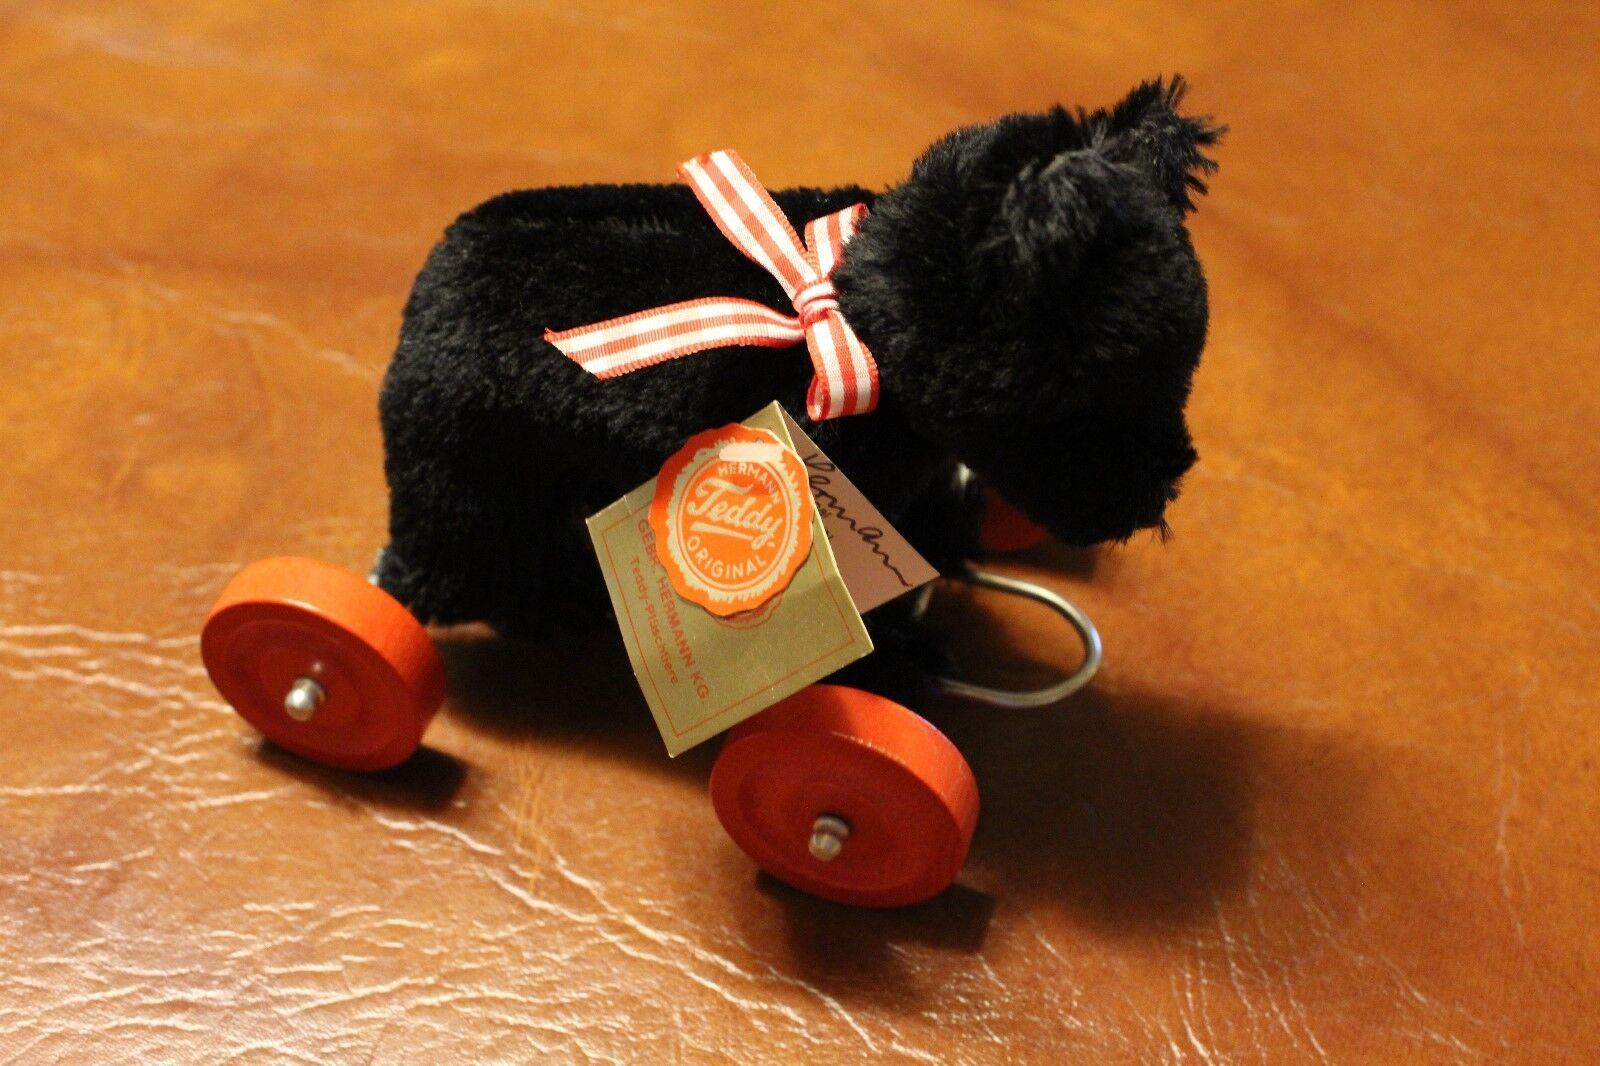 Hermann Teddy Bear Made in West Germany on Wheels - NICE